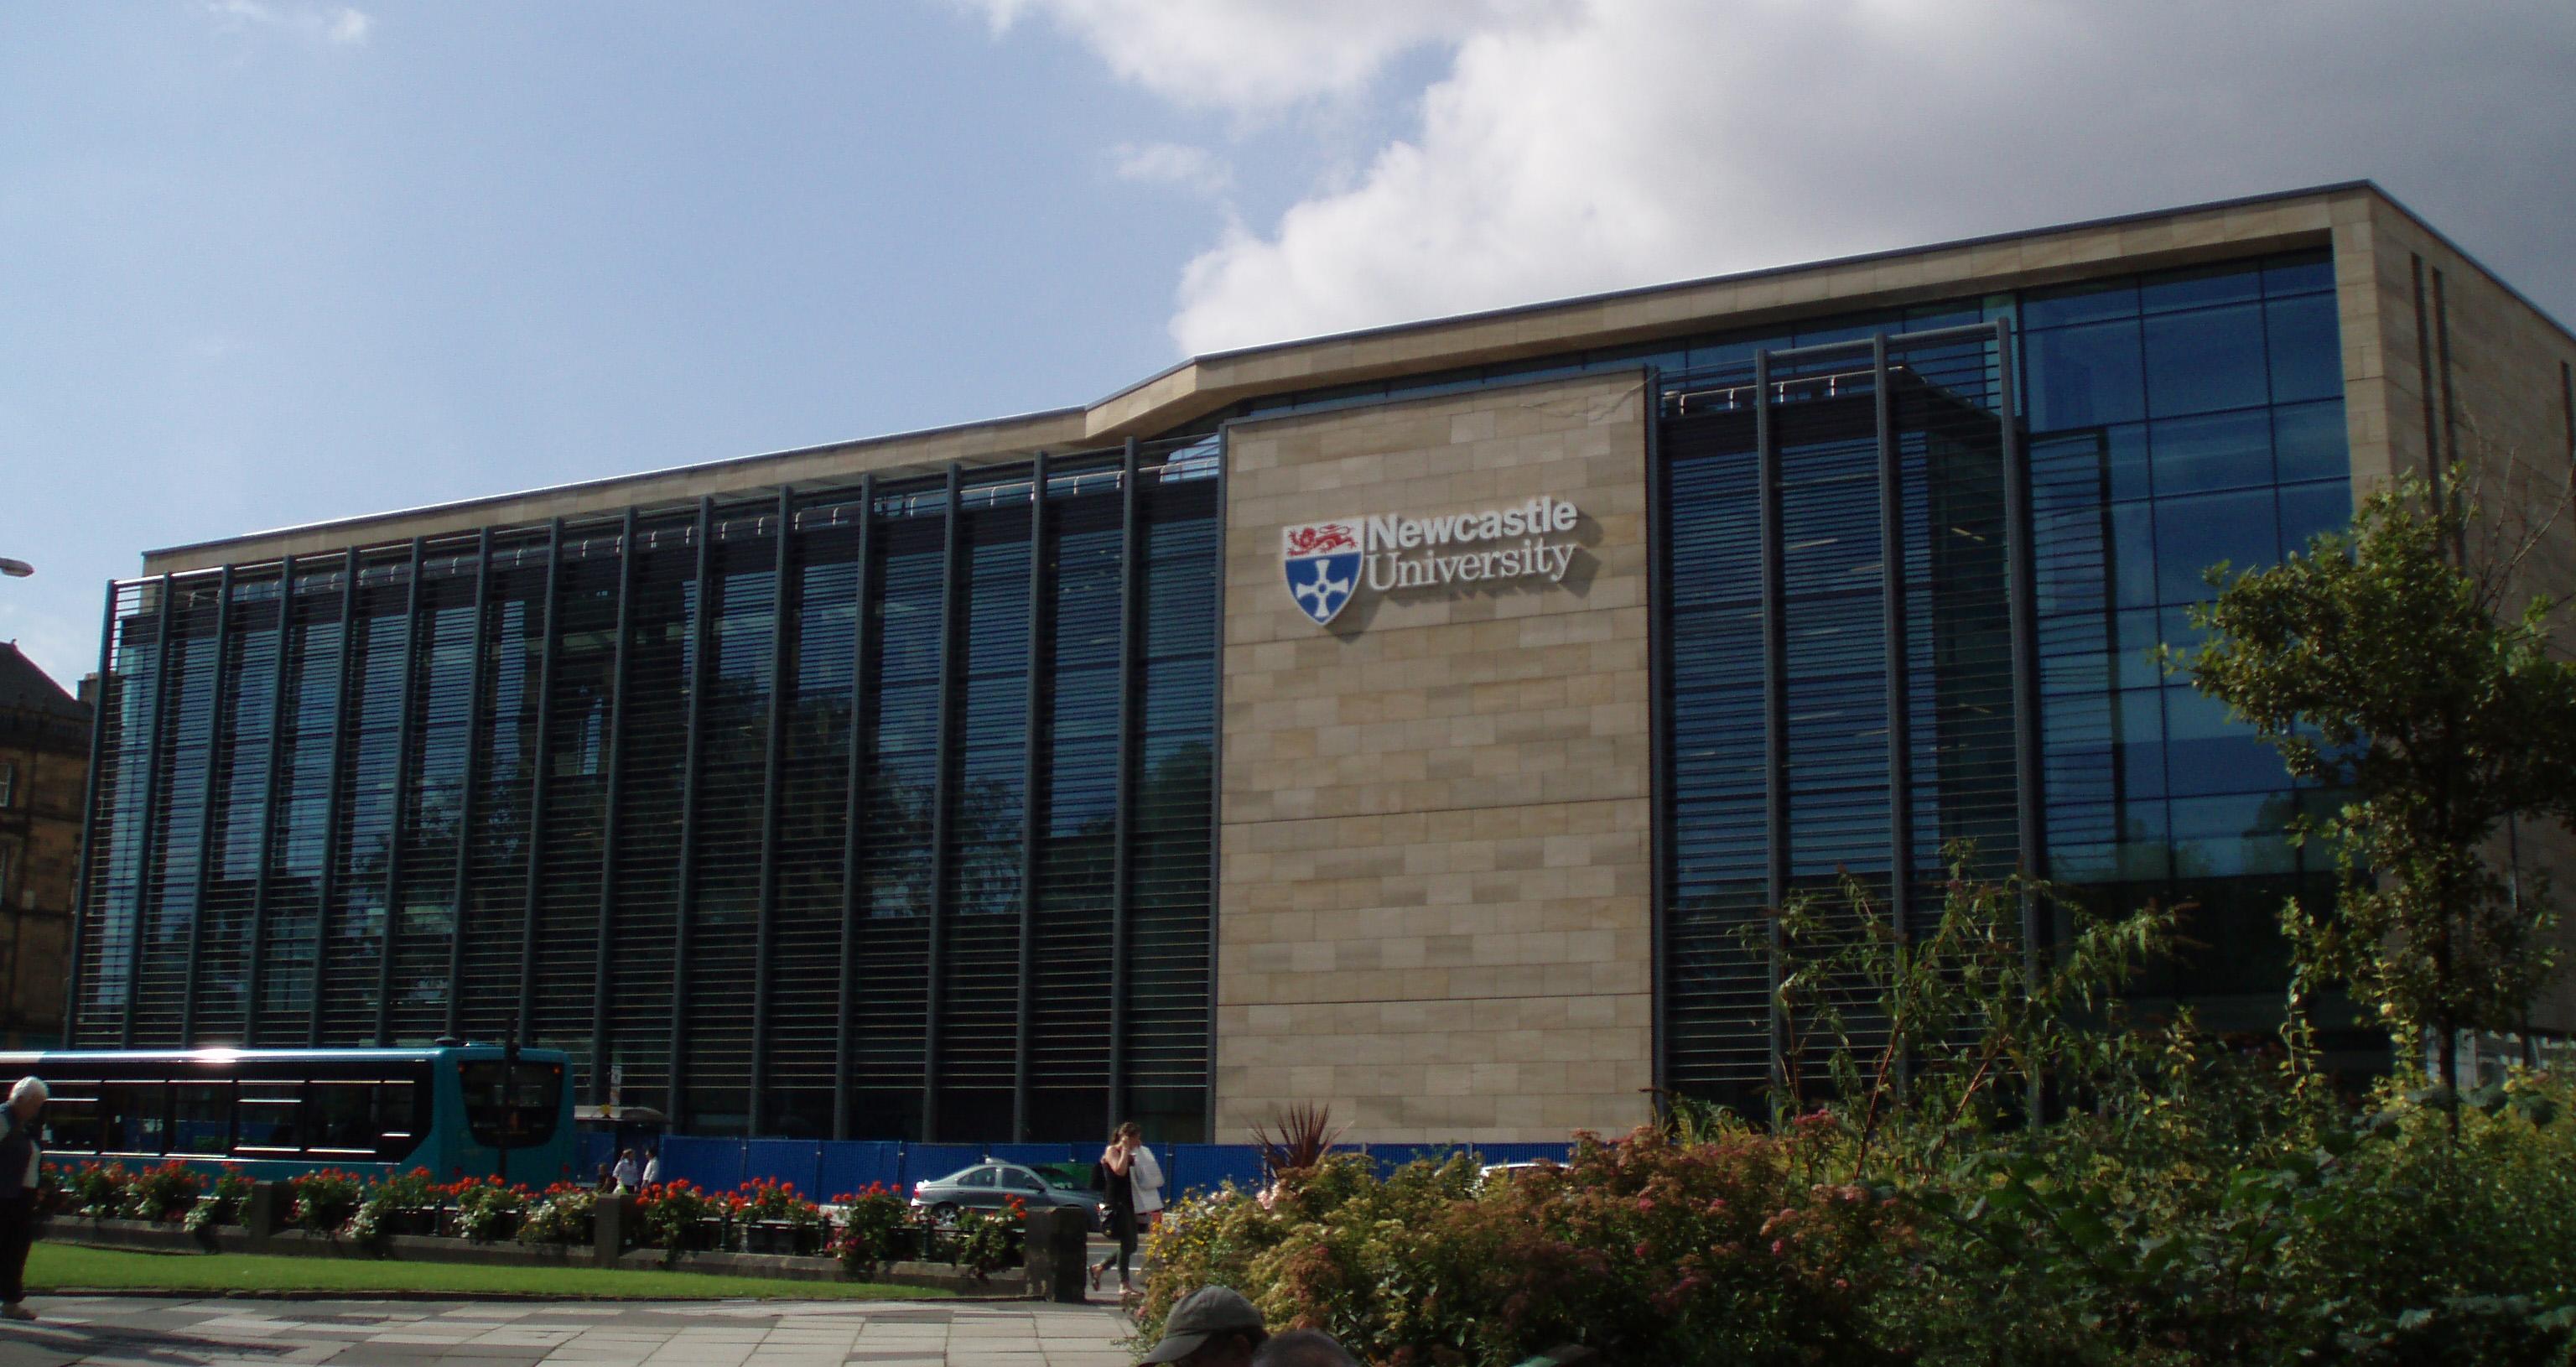 Nicr Building Newcastle University